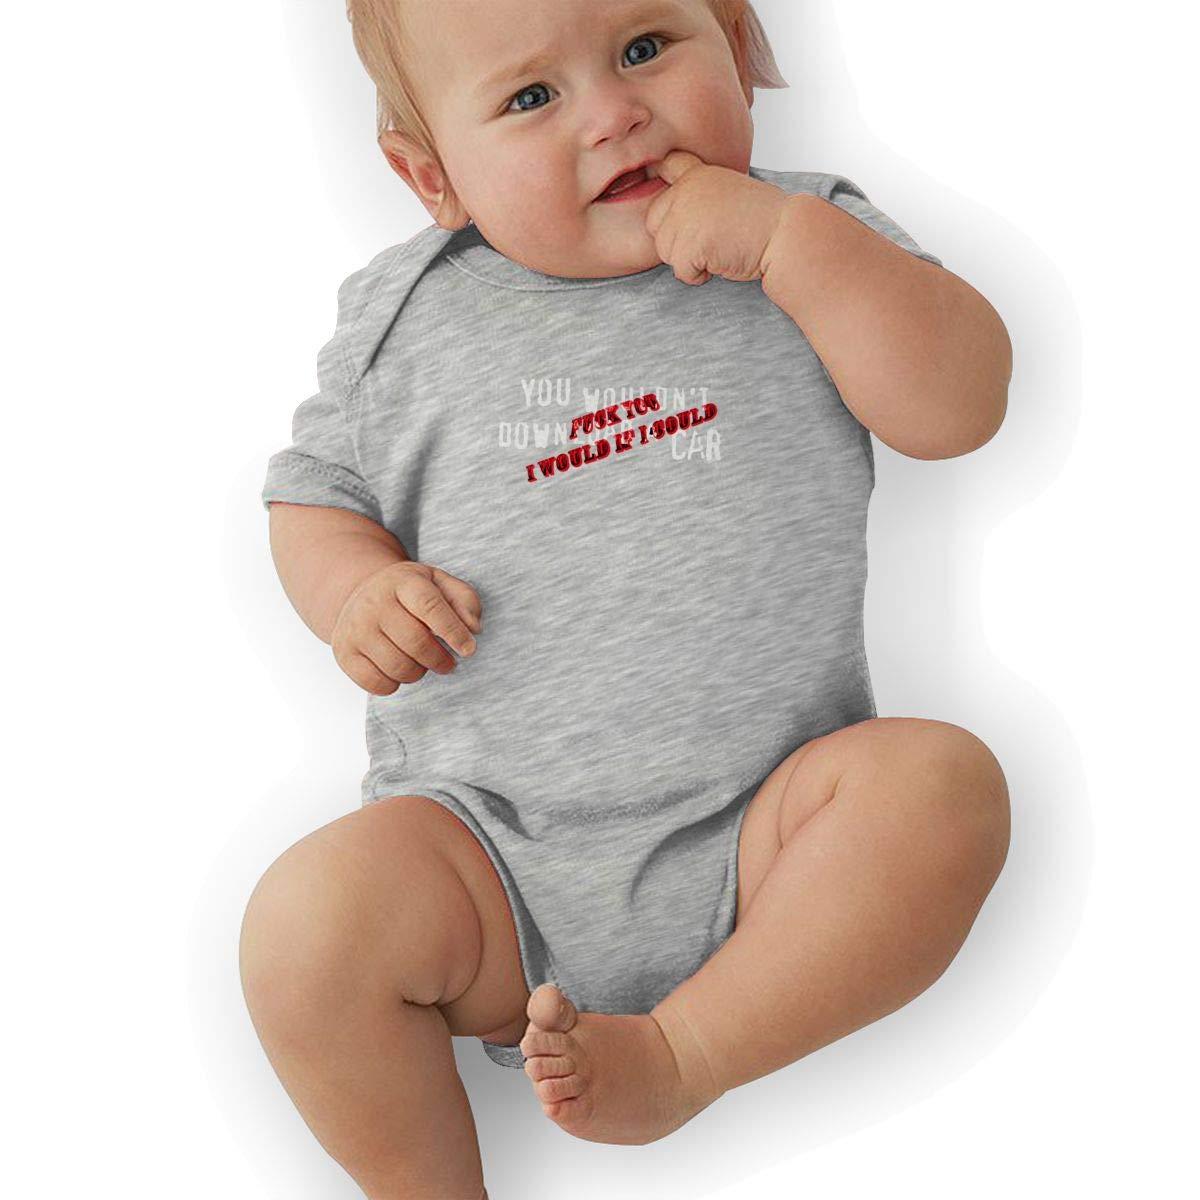 HappyLifea I Would If I Could Newborn Baby Short Sleeve Romper Infant Summer Clothing Black